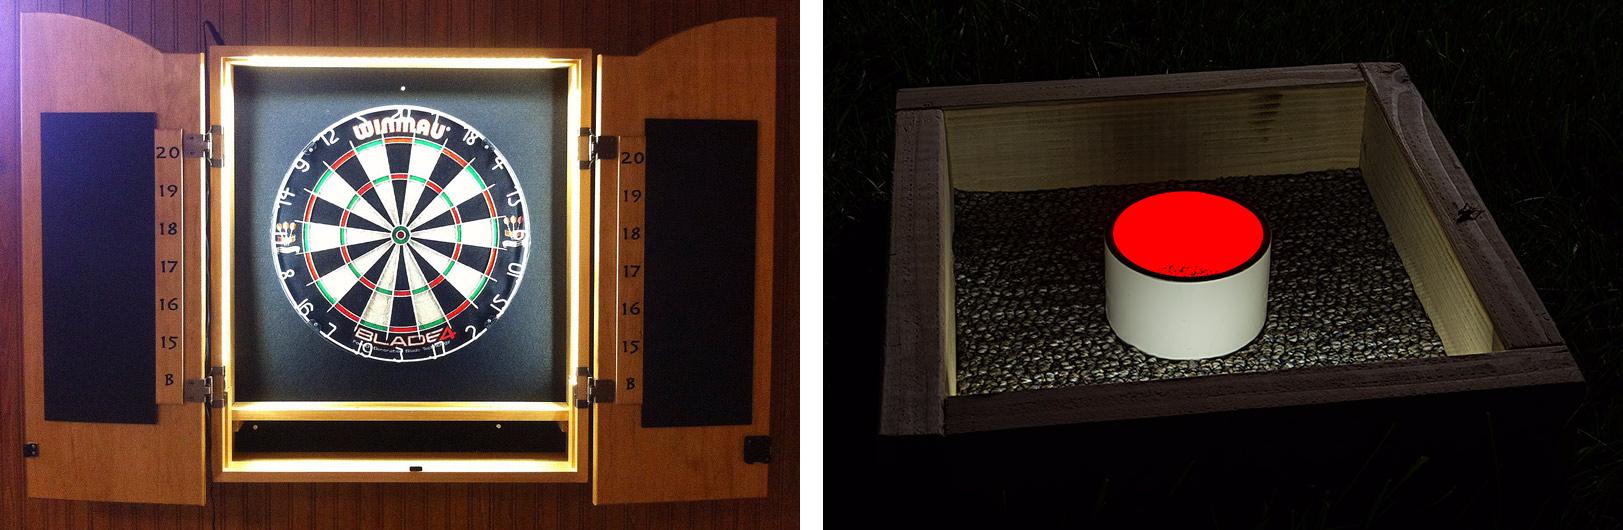 portable LED strip lights - indoor outdoor game lights